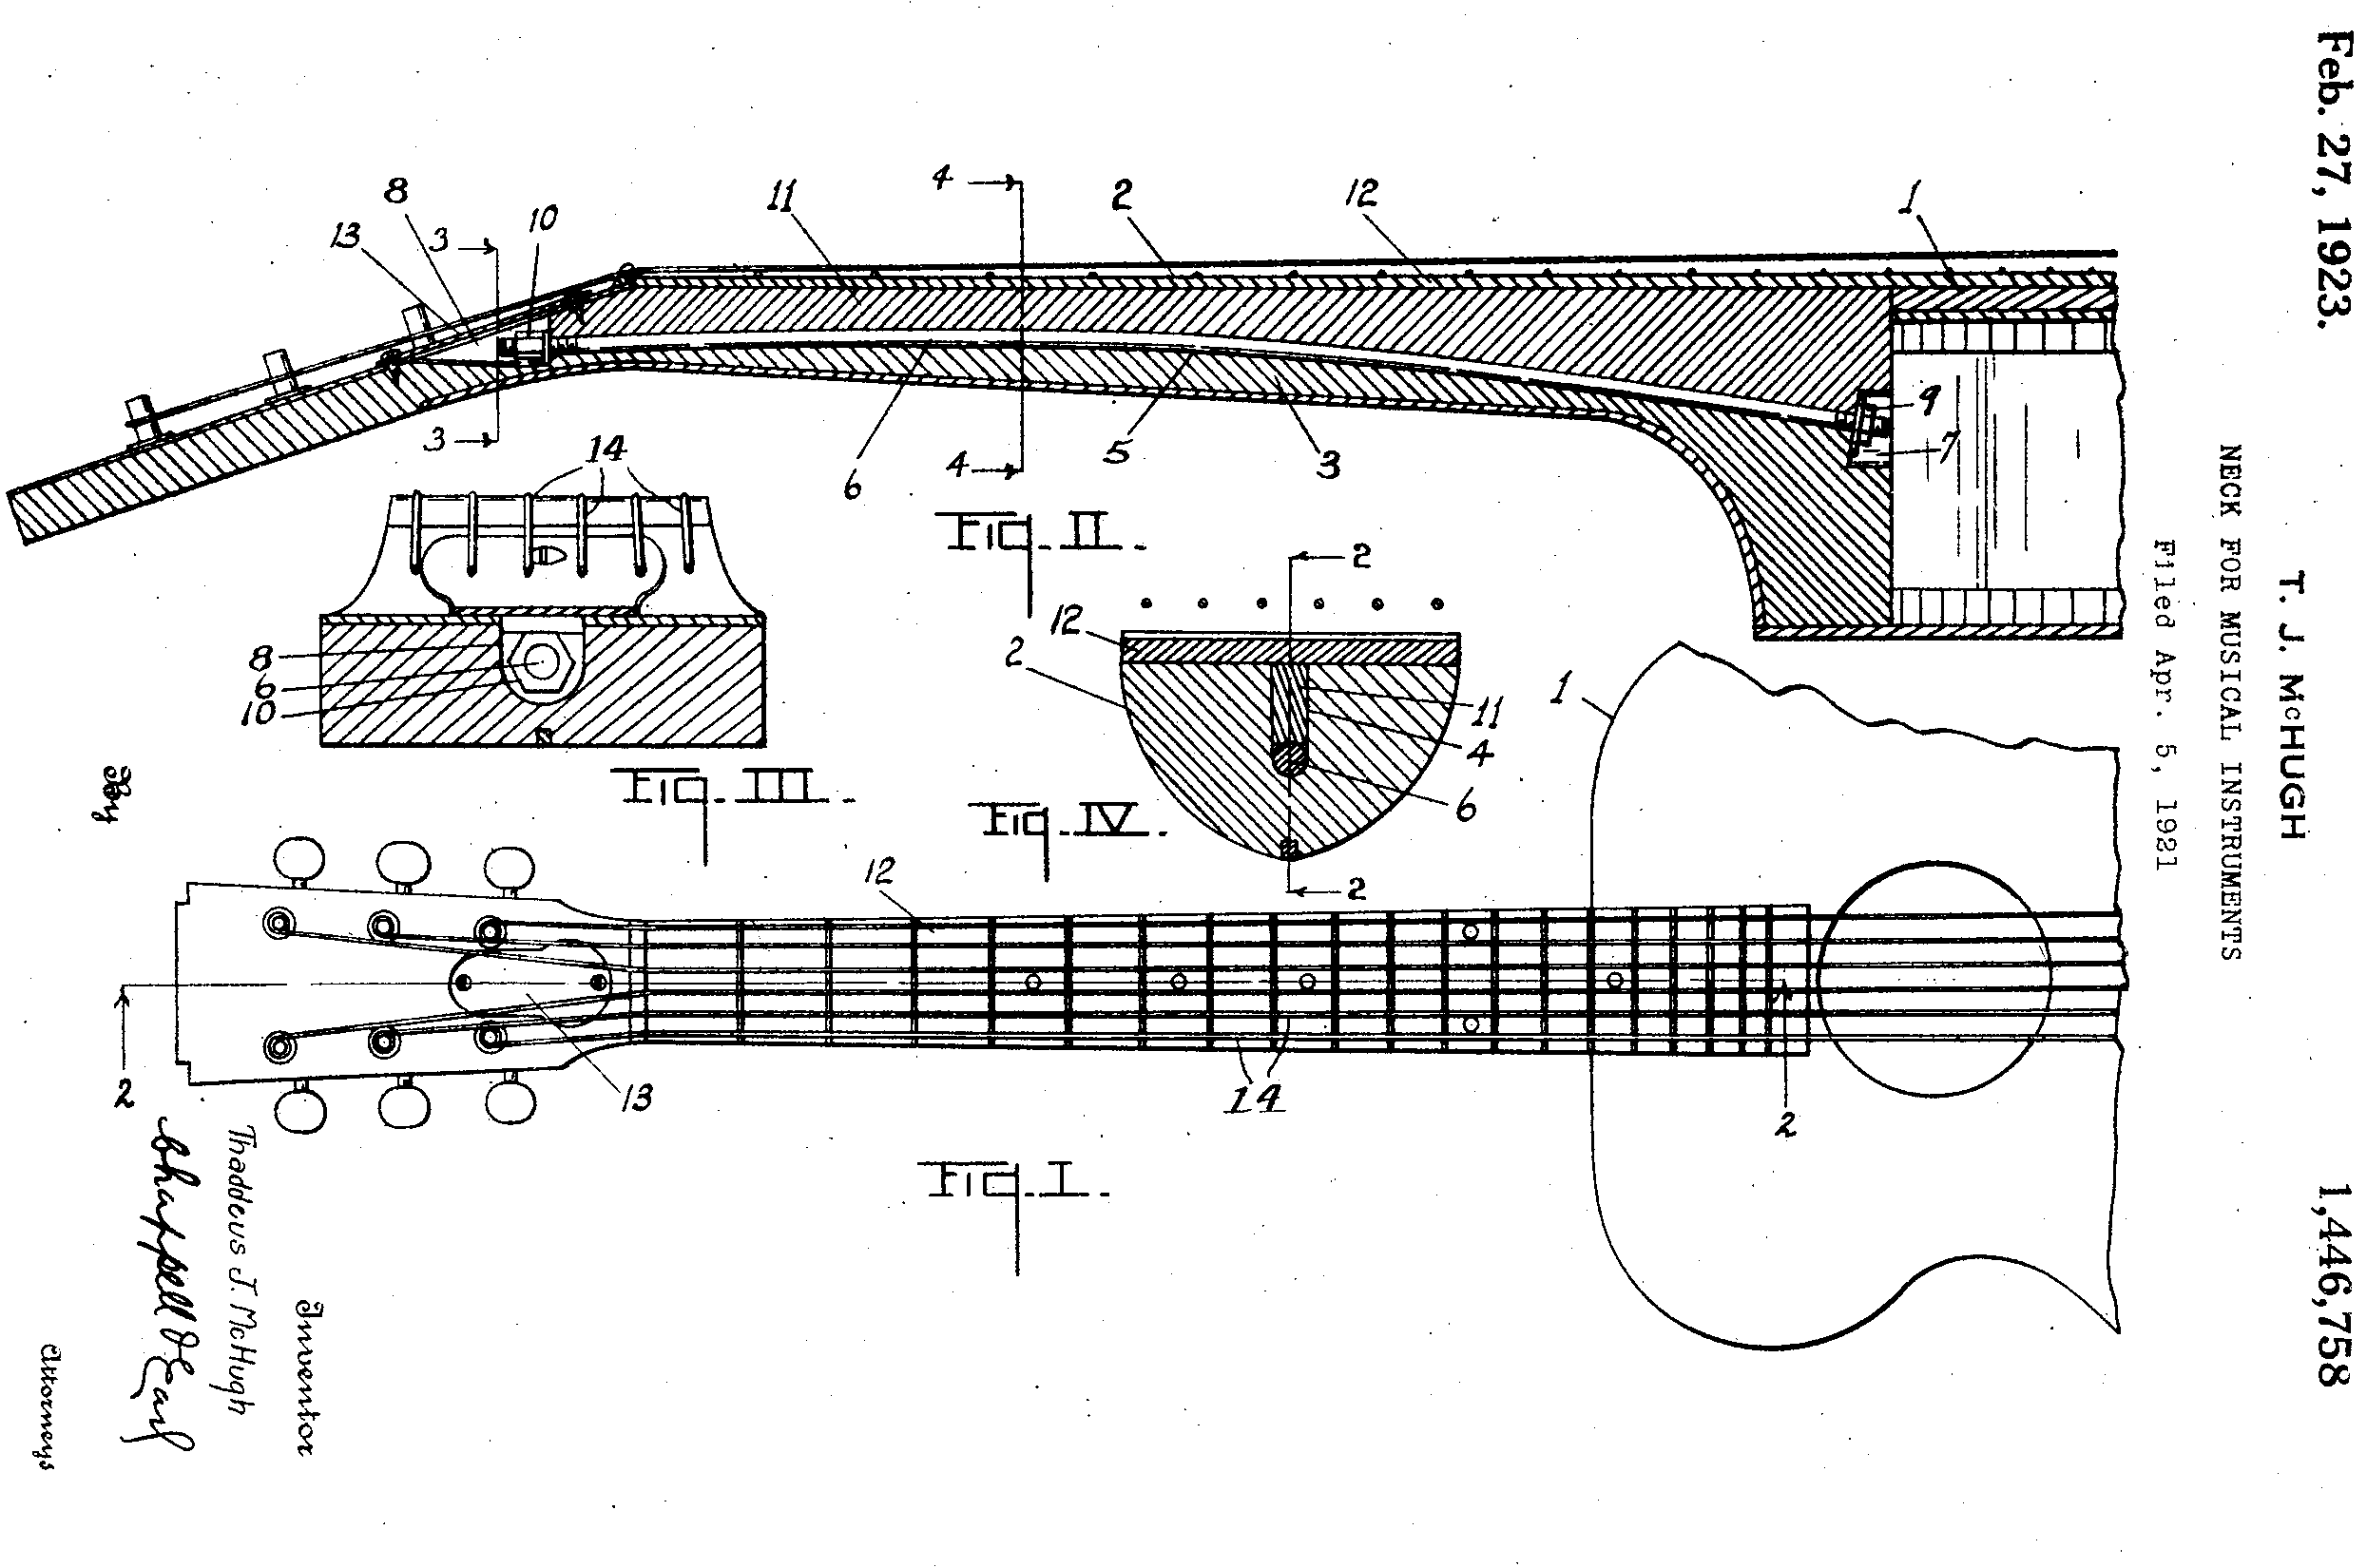 Guitar+truss+rod+adjustment